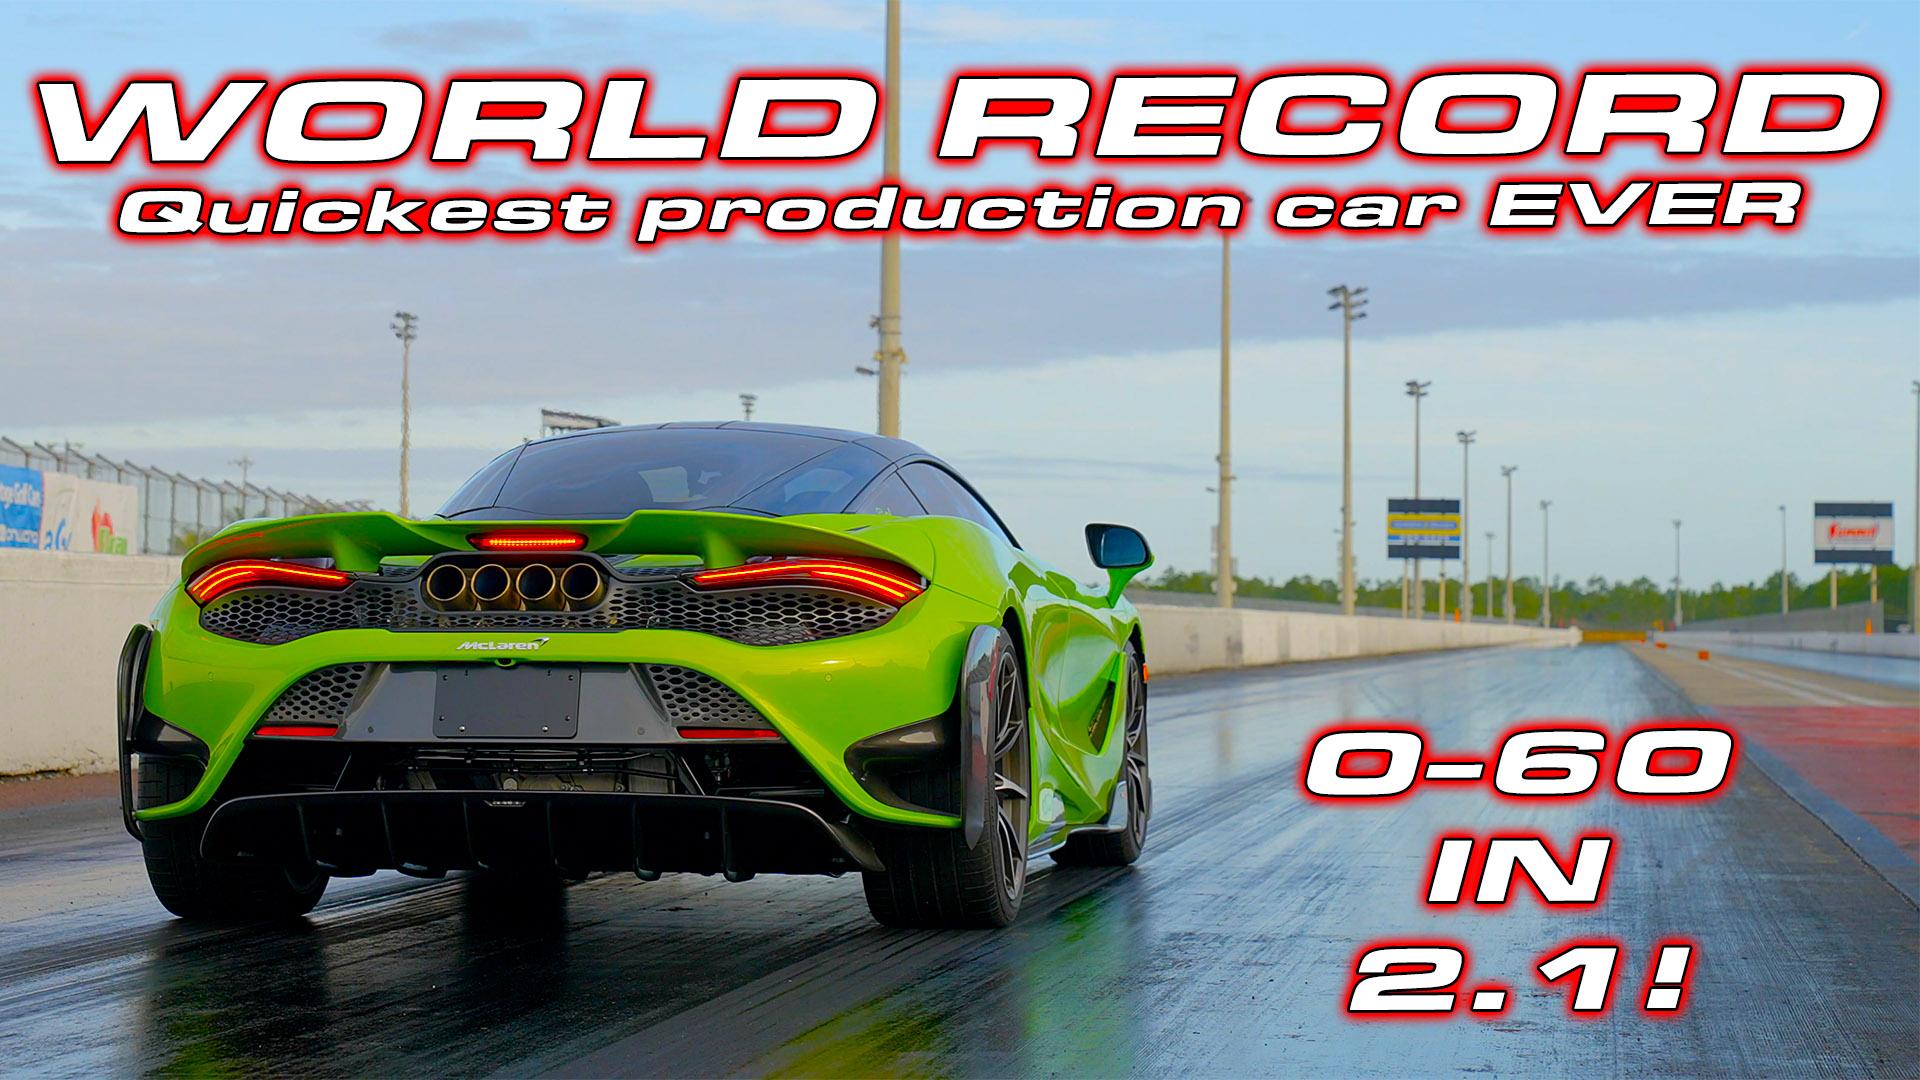 McLaren 765LT World Record 1/4 Mile